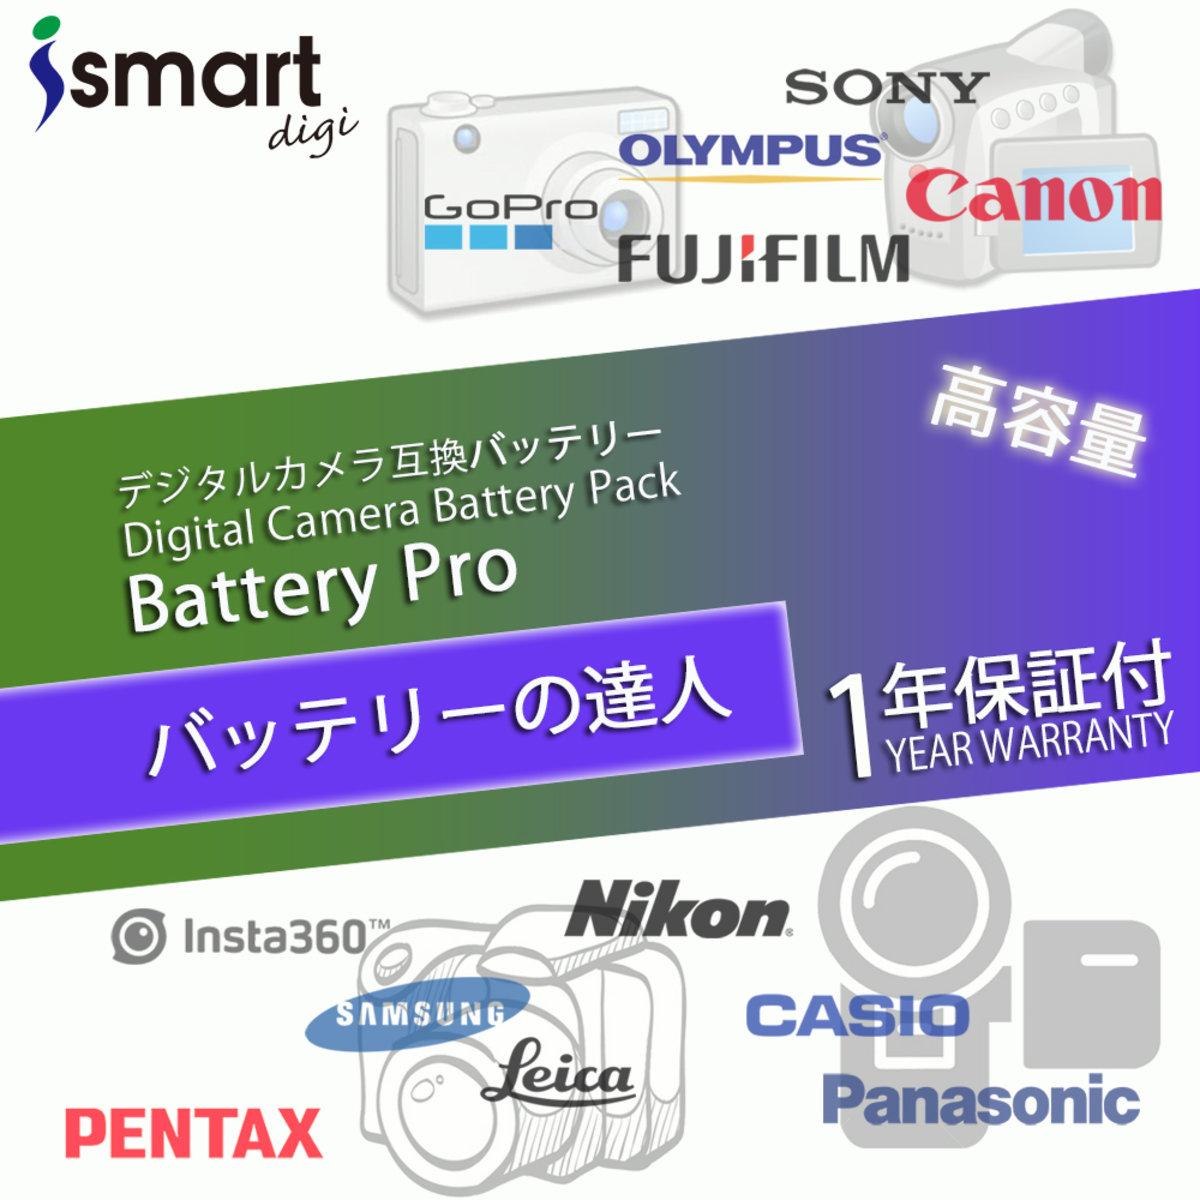 Olympus Digital Camera Battery (For:Mju 7010, Mju 7020, Mju 7030, Mju 7040, Mju 7050, T-110,  µ-7000, μ-7020, μ-7040)